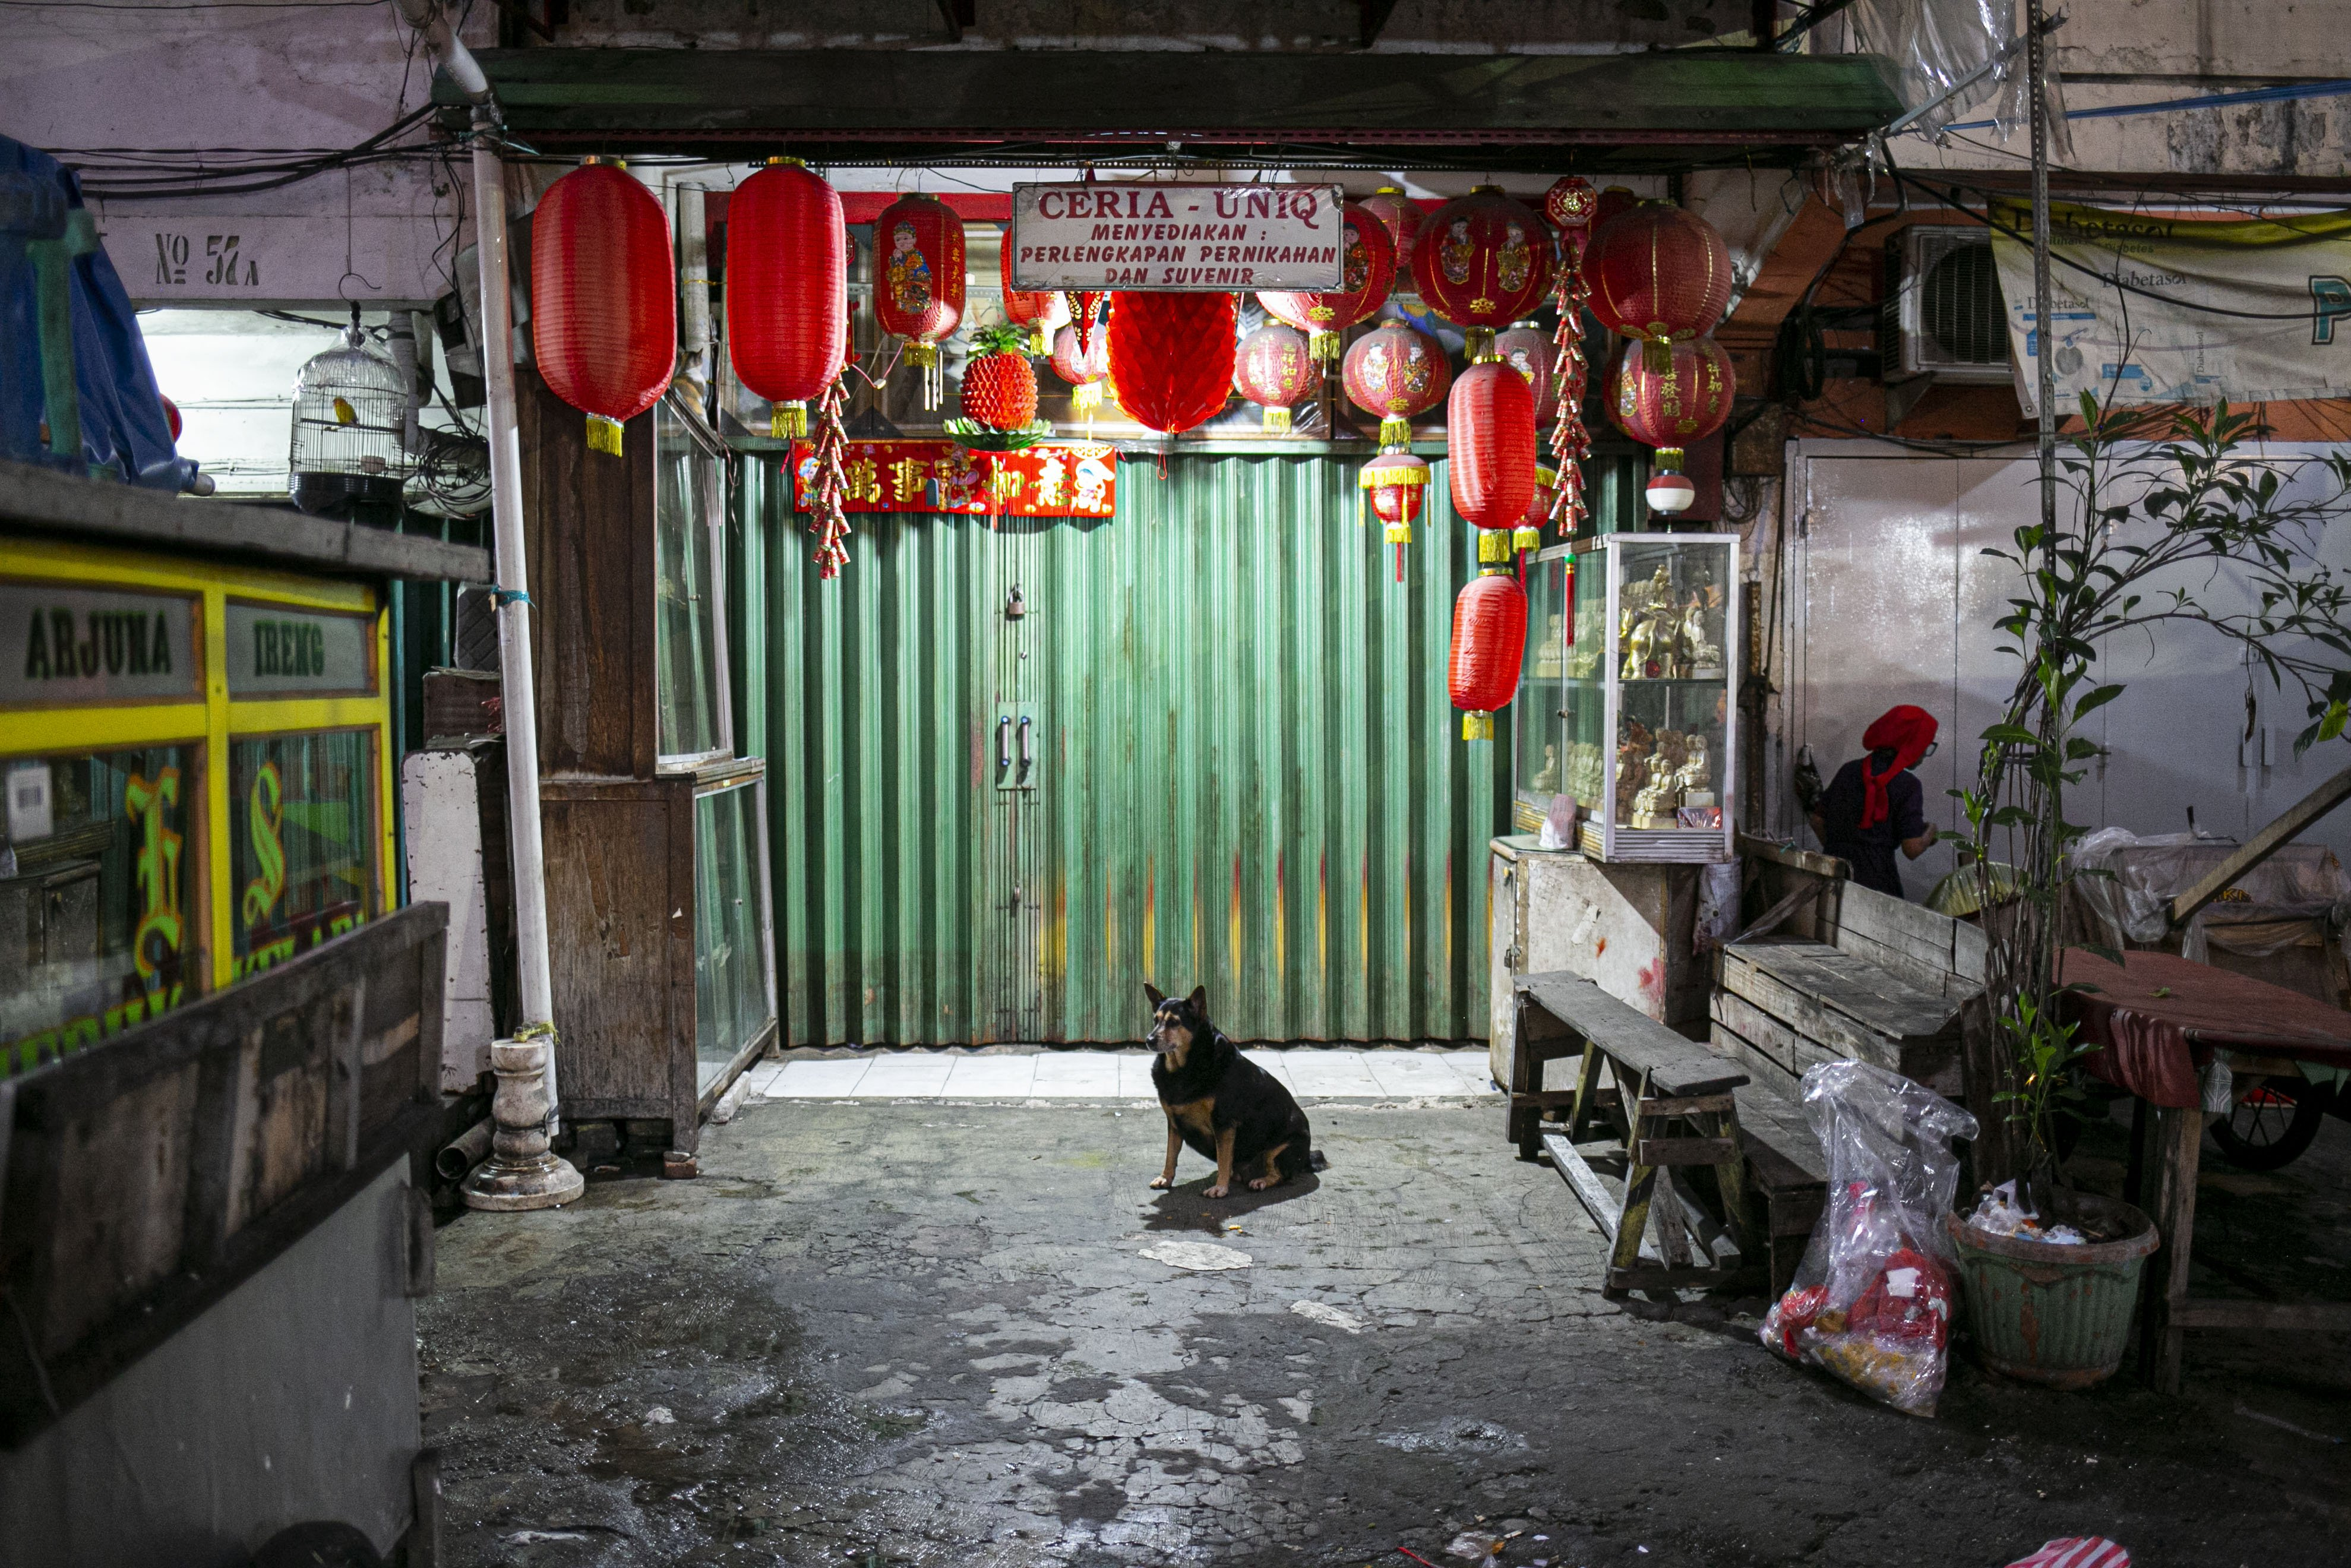 Toko suvenir khas imlek yang tutup lebih awal di Pasar Glodok, Jakarta, Kamis (11/2/2021). Pedagang di lokasi tersebut mengaku penjualan tahun ini anjlok hingga 80 persen dibandingkan tahun lalu akibat pandemi COVID 19.